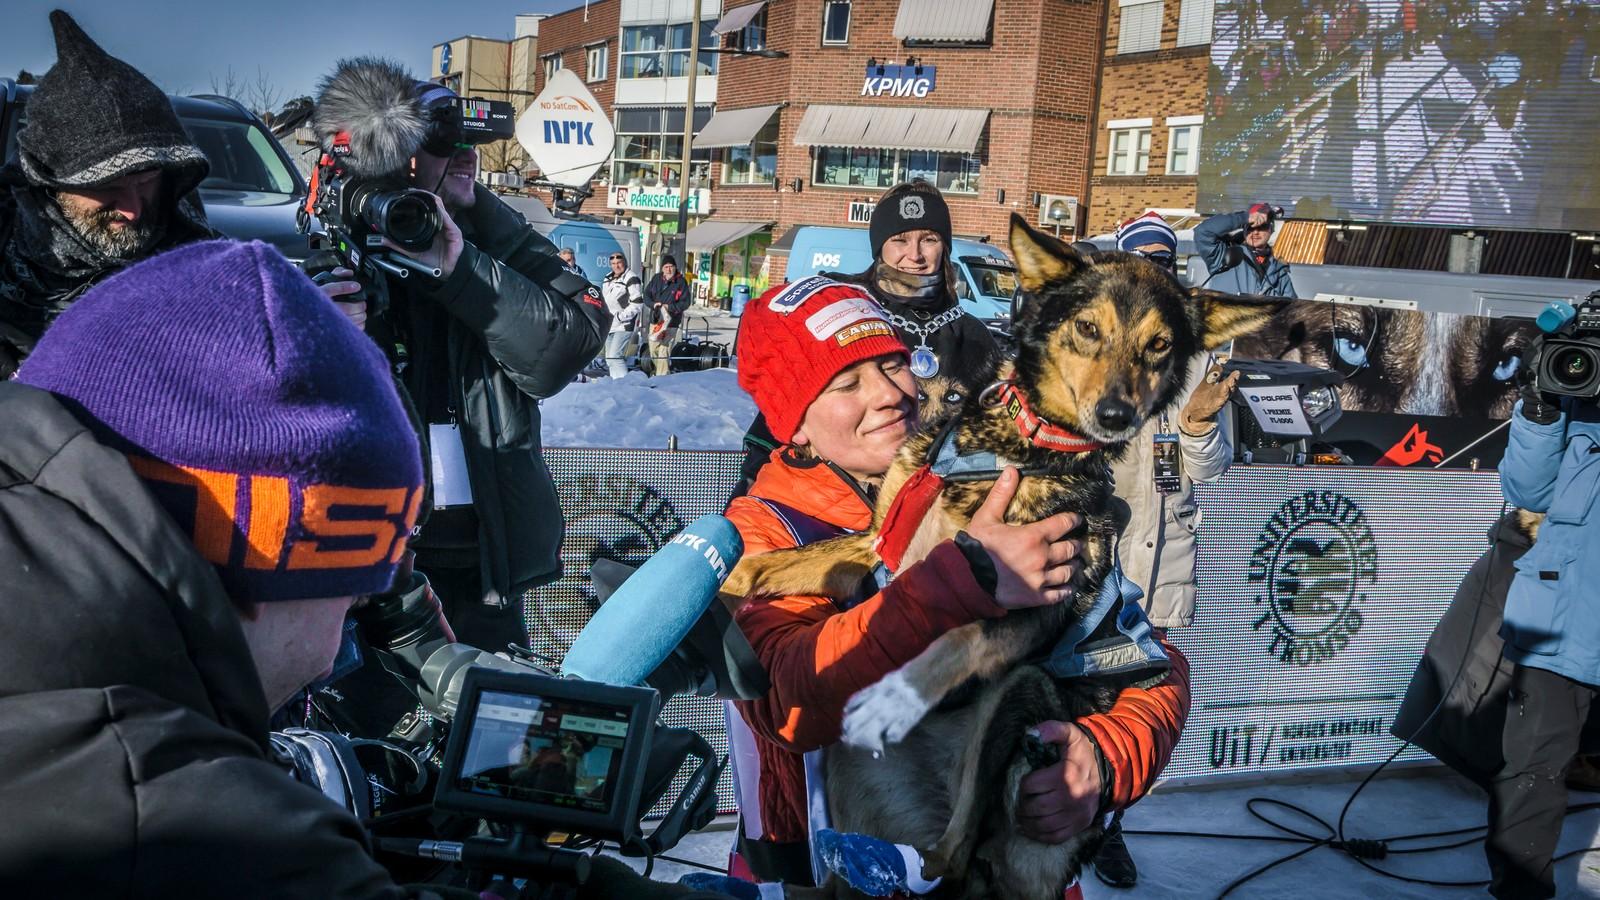 Kasin hedret lederhunden sin etter hun kom i mål i Alta.